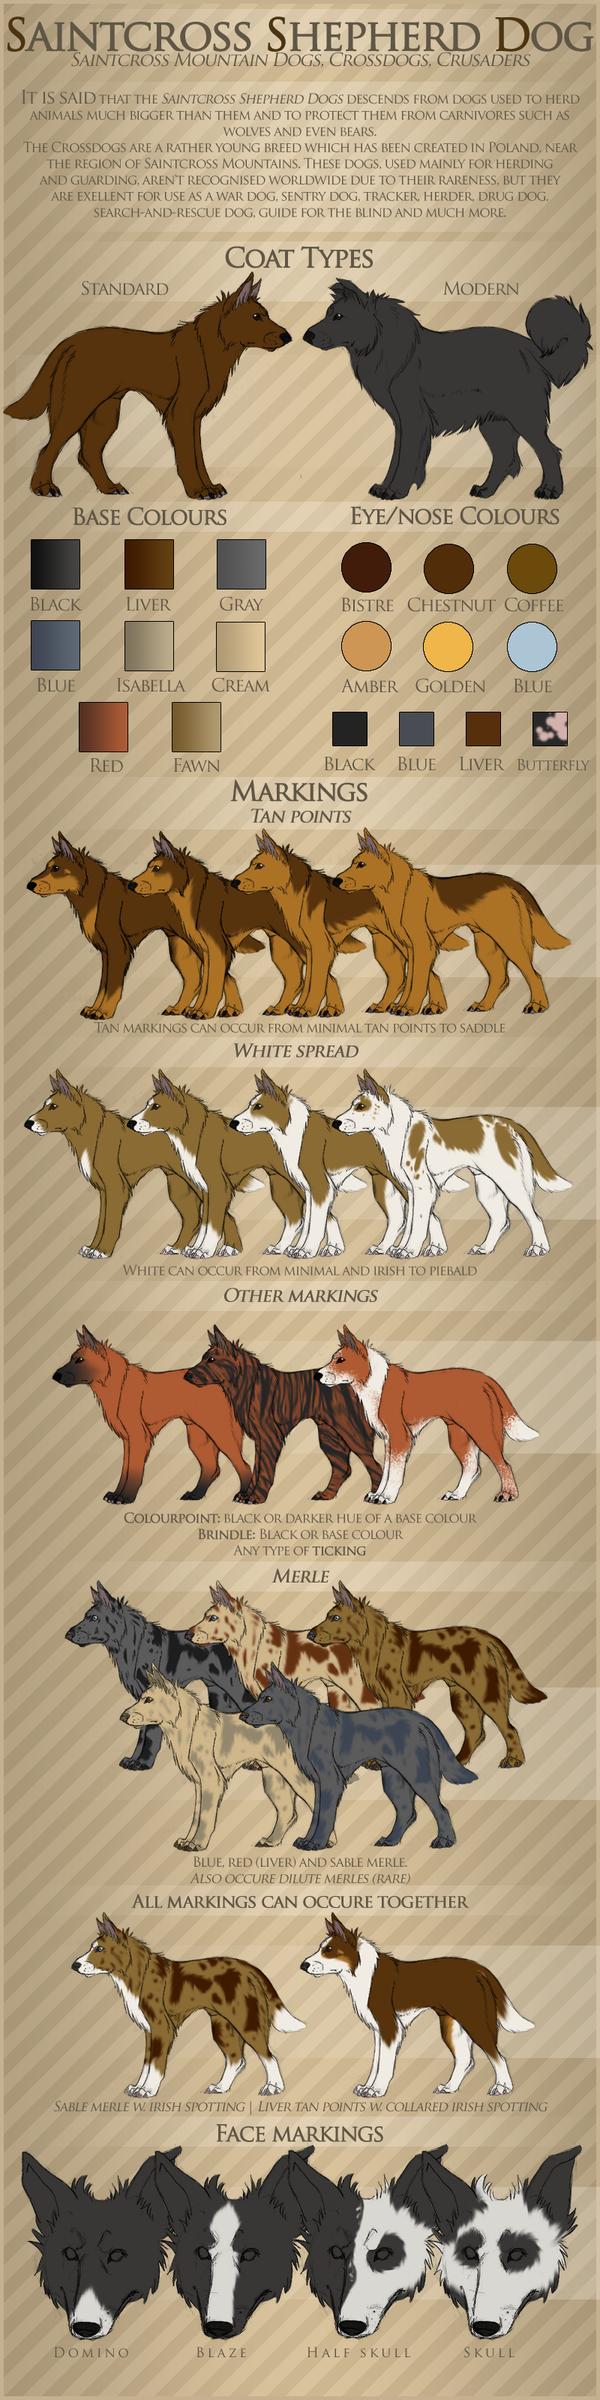 Saintcross Shepherd Dog breedsheet by bunnysmooches